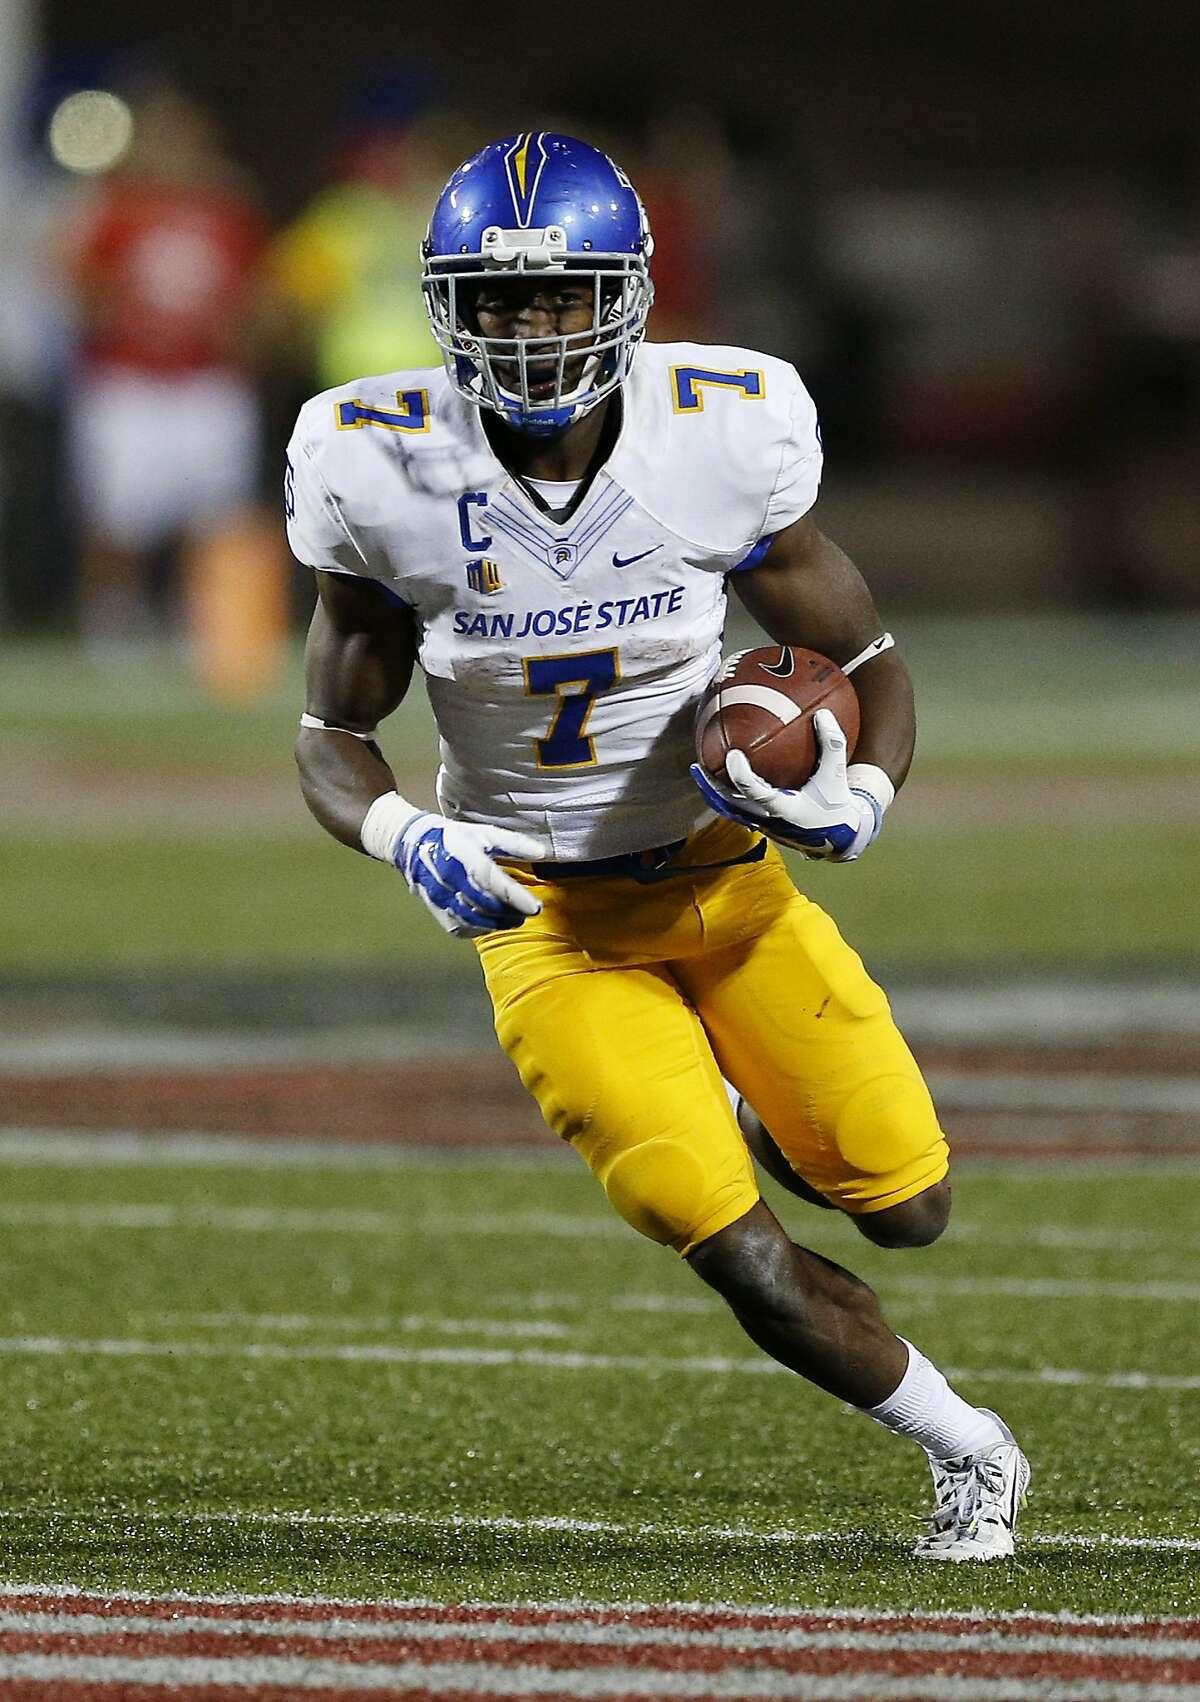 San Jose State running back Tyler Ervin (7) runs against UNLV during an NCAA college football game Saturday, Oct. 10, 2015, in Las Vegas. (AP Photo/John Locher)